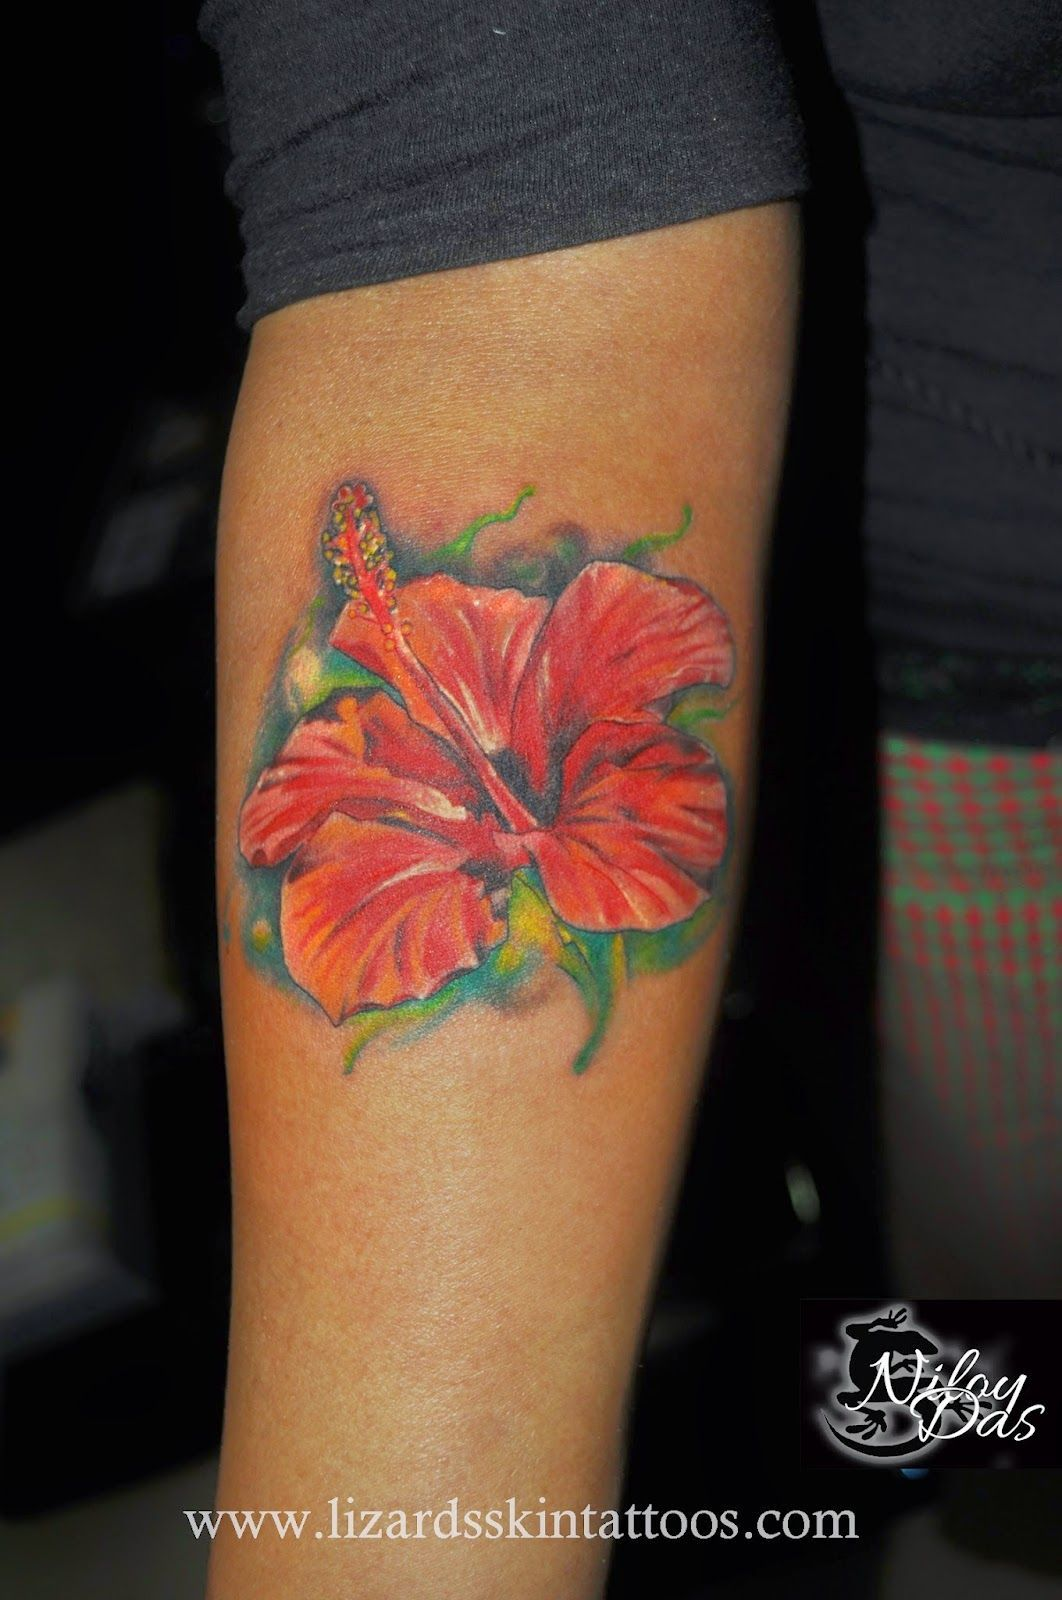 Hibiscus flower tattoo hawaiiantattoosforearm hawaiian tattoos hibiscus flower tattoo hawaiiantattoosforearm izmirmasajfo